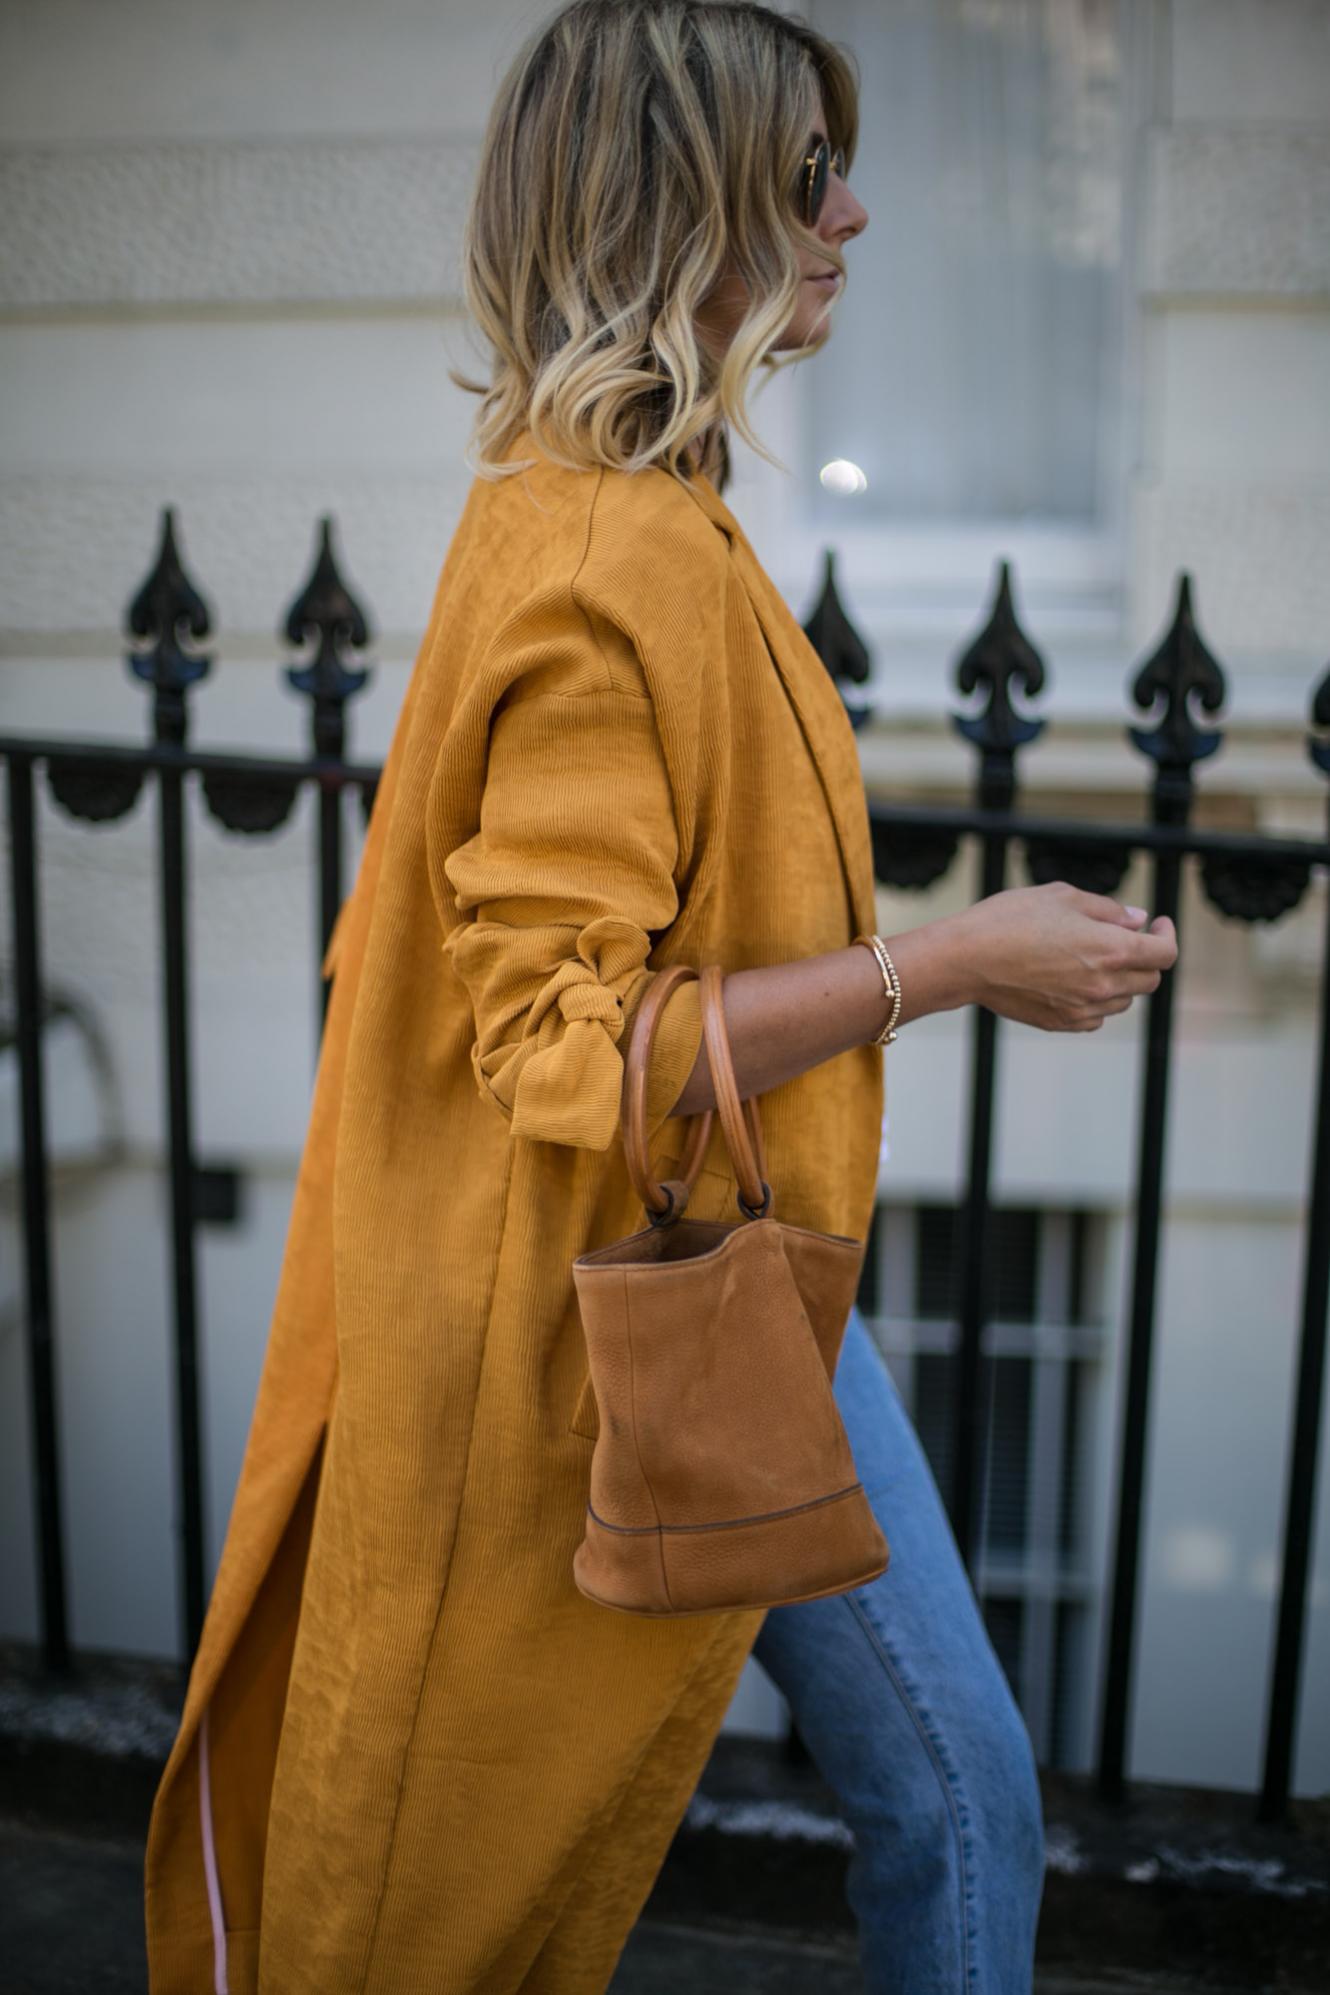 Mustard yellow duster coat